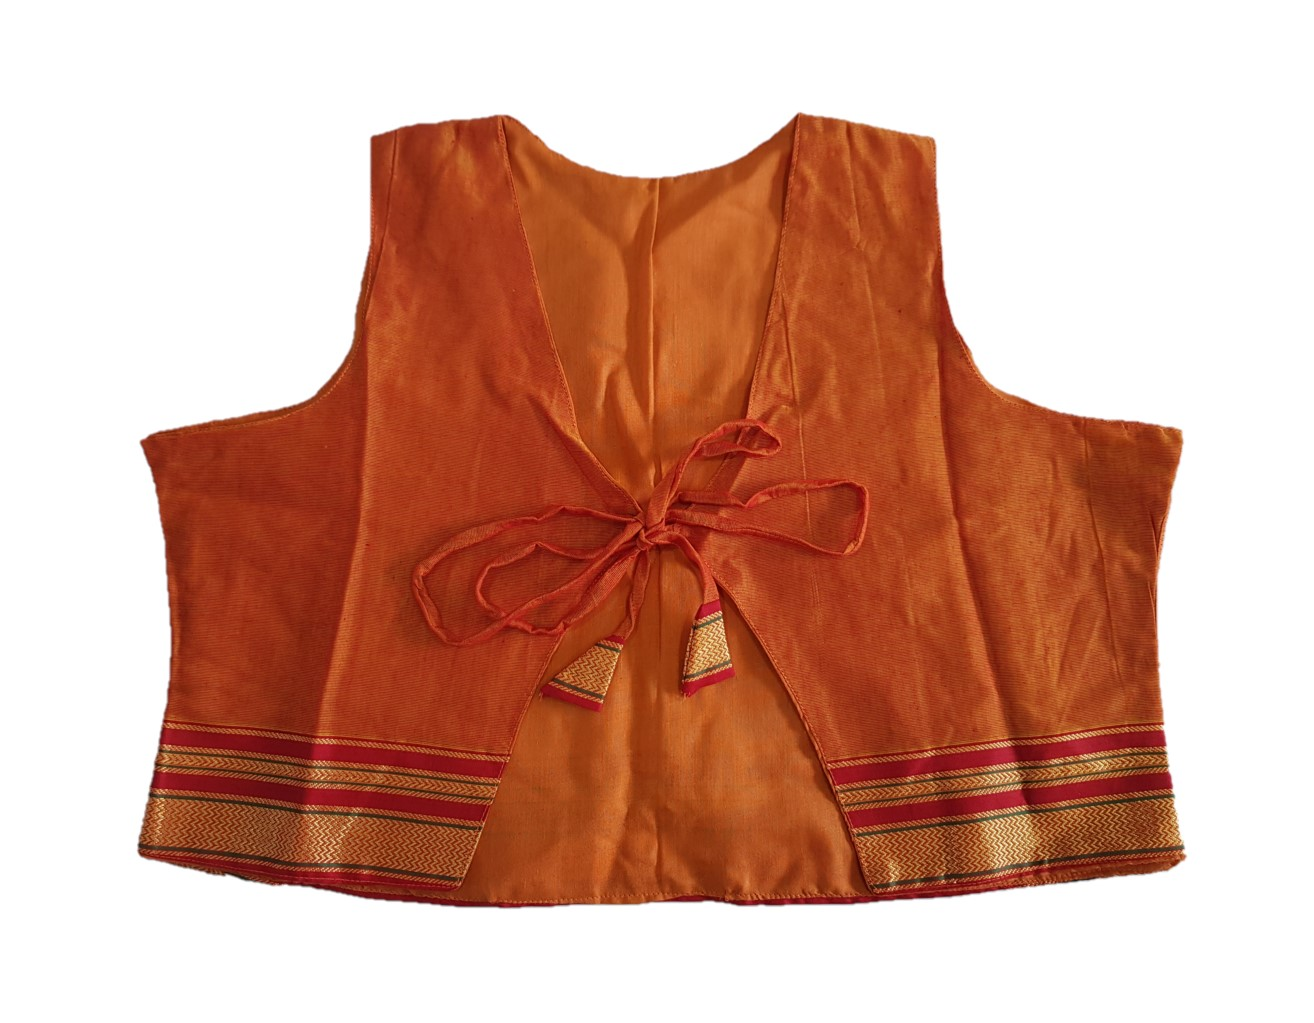 Ilkal Cotton Silk Jacket Short Waist Coat with Front Knot Orange Size Large : Picture